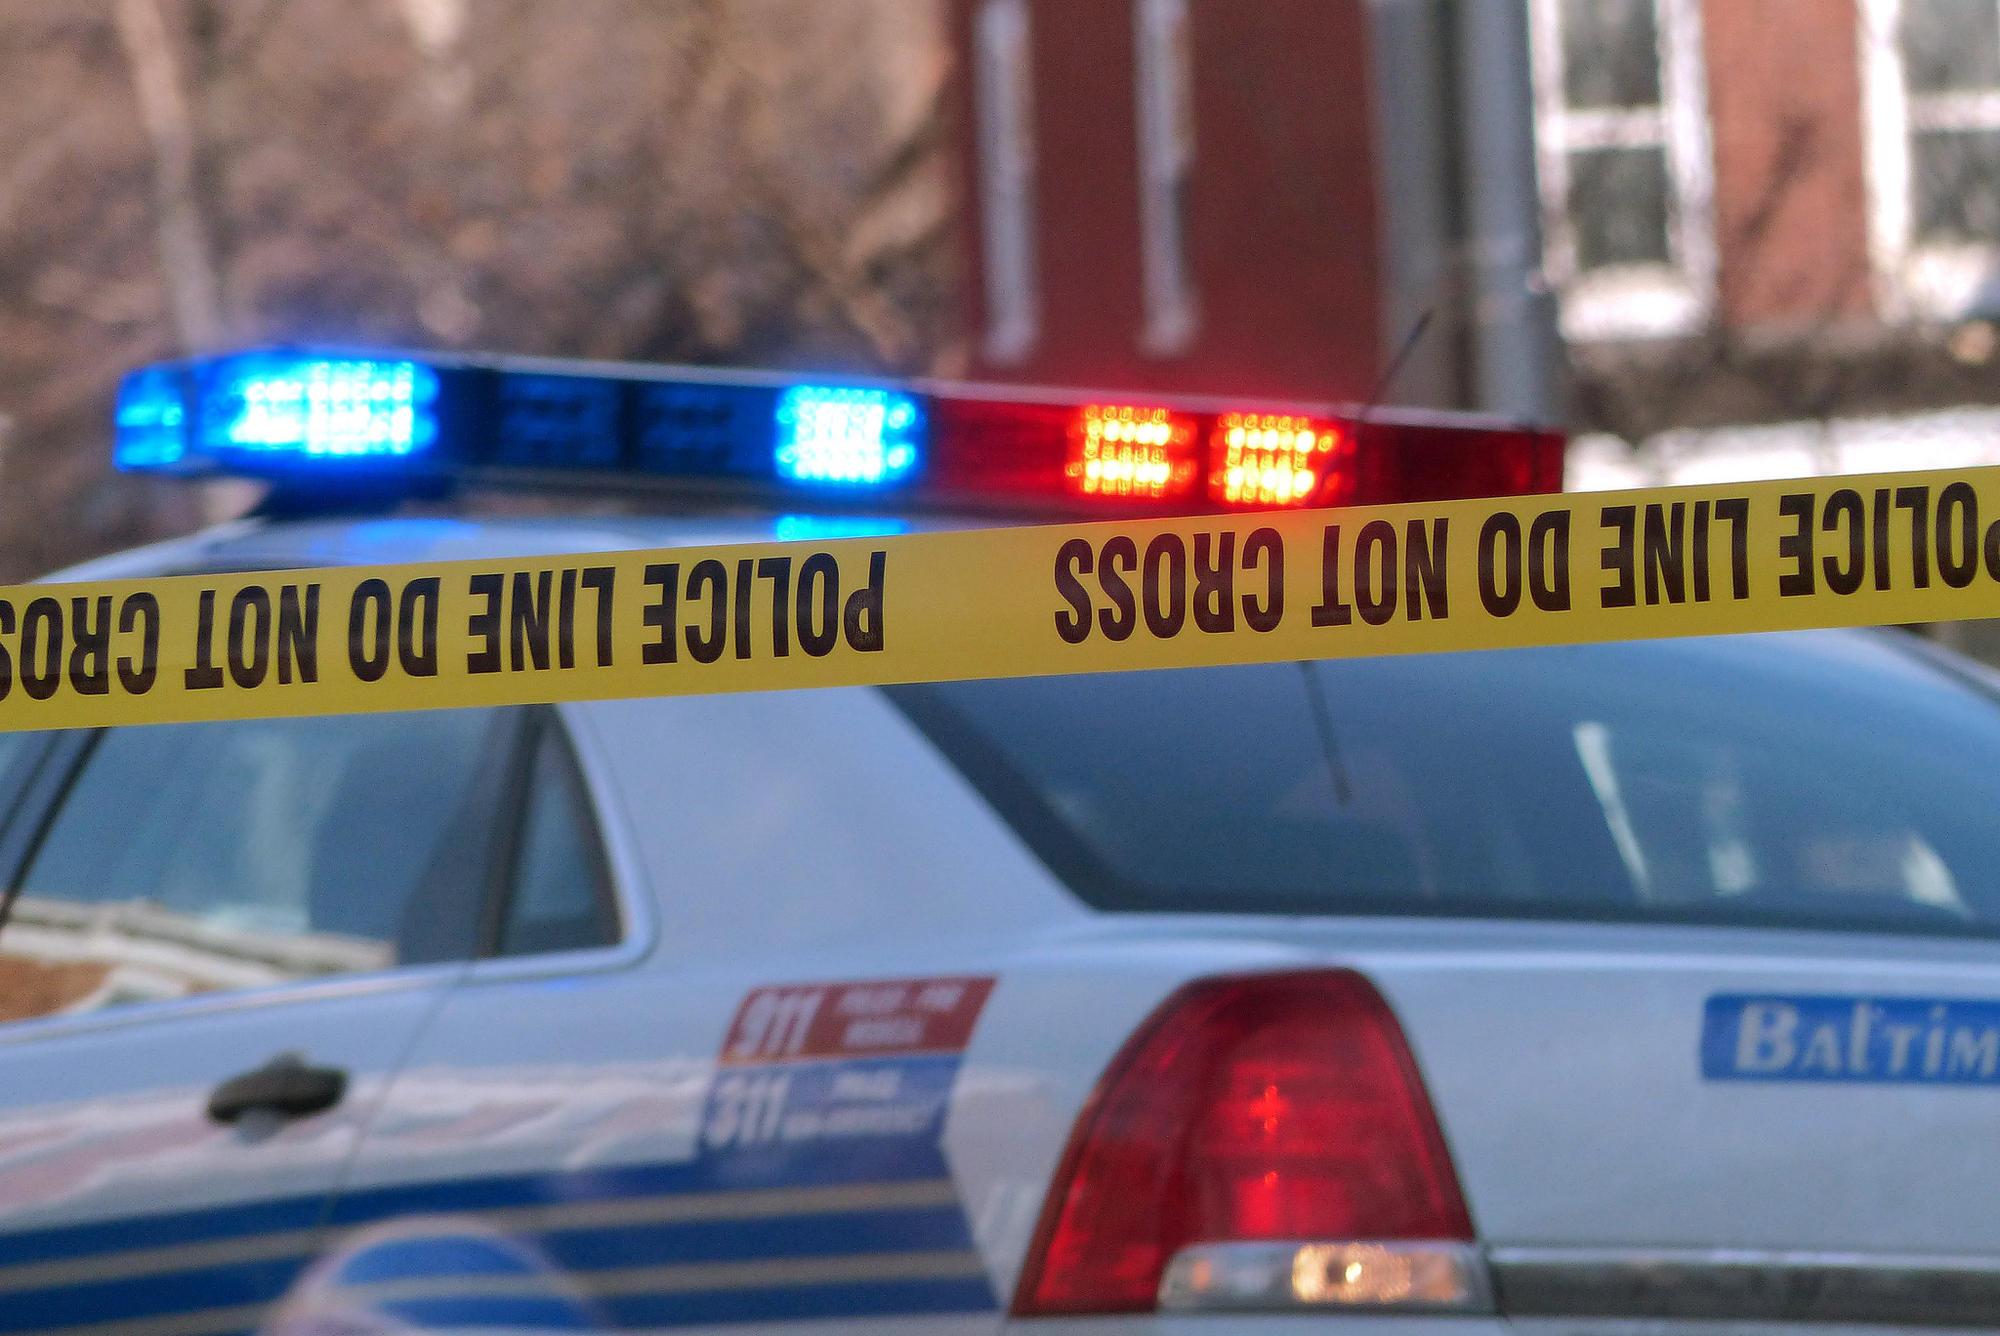 Baltimore police identify three recent homicide victims